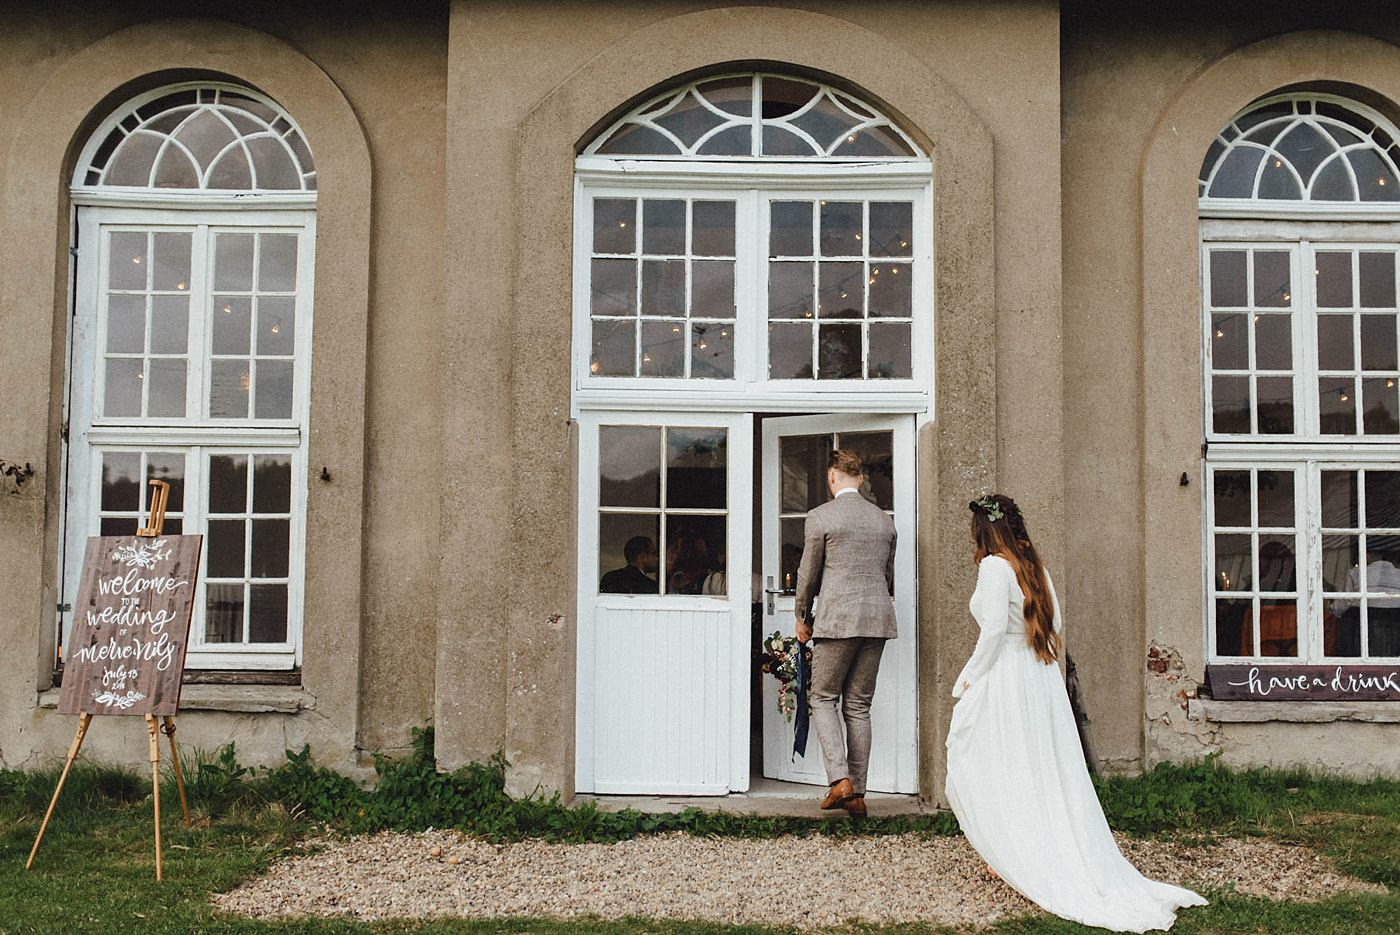 urban-elopement-wedding-254